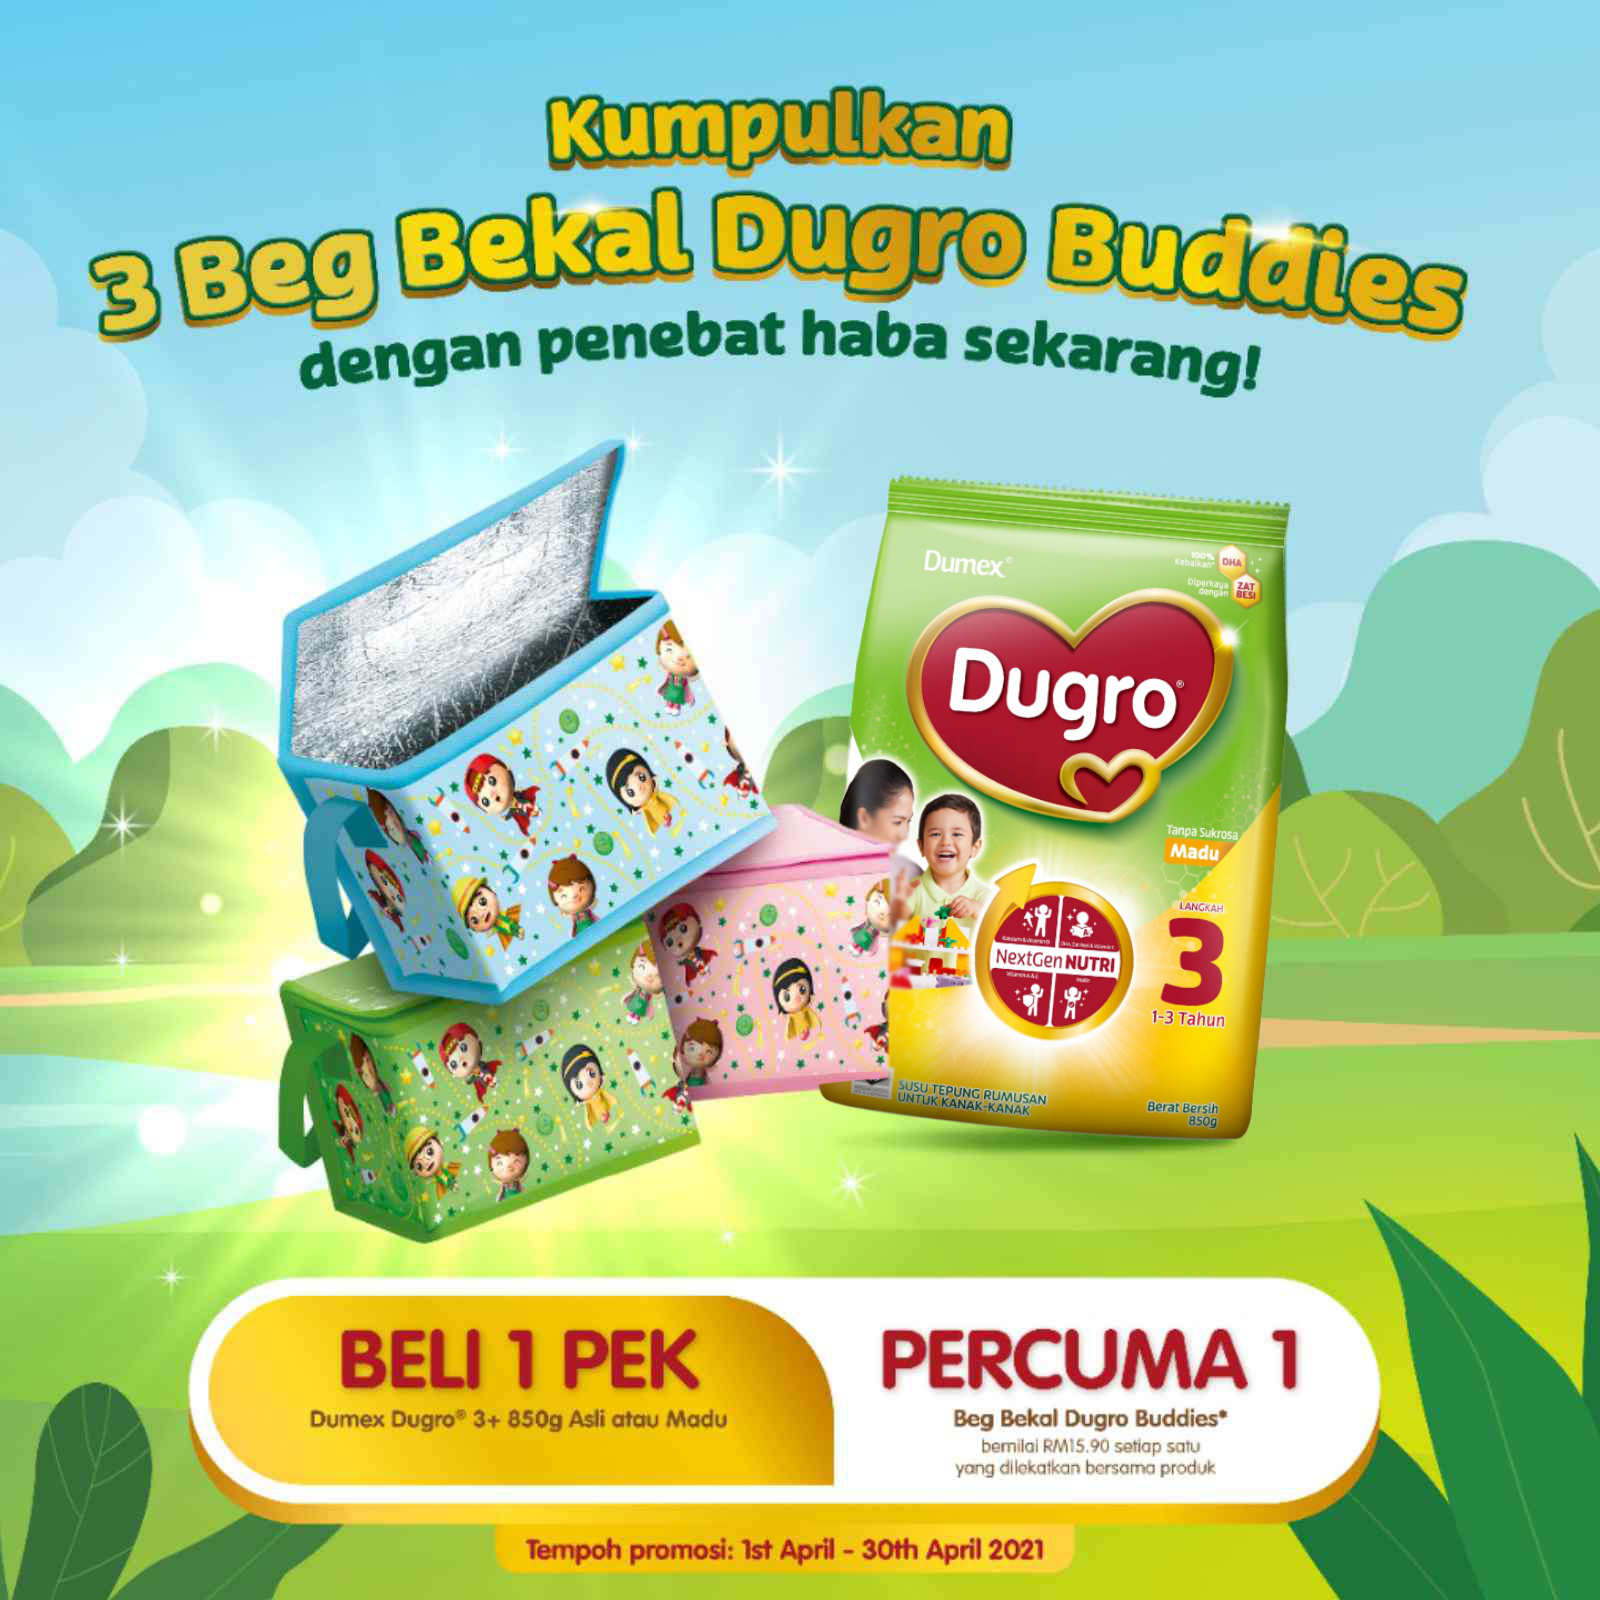 Dumex Dugro 3 Madu (850g) FOC Dugro Buddies Lunch Box Bag